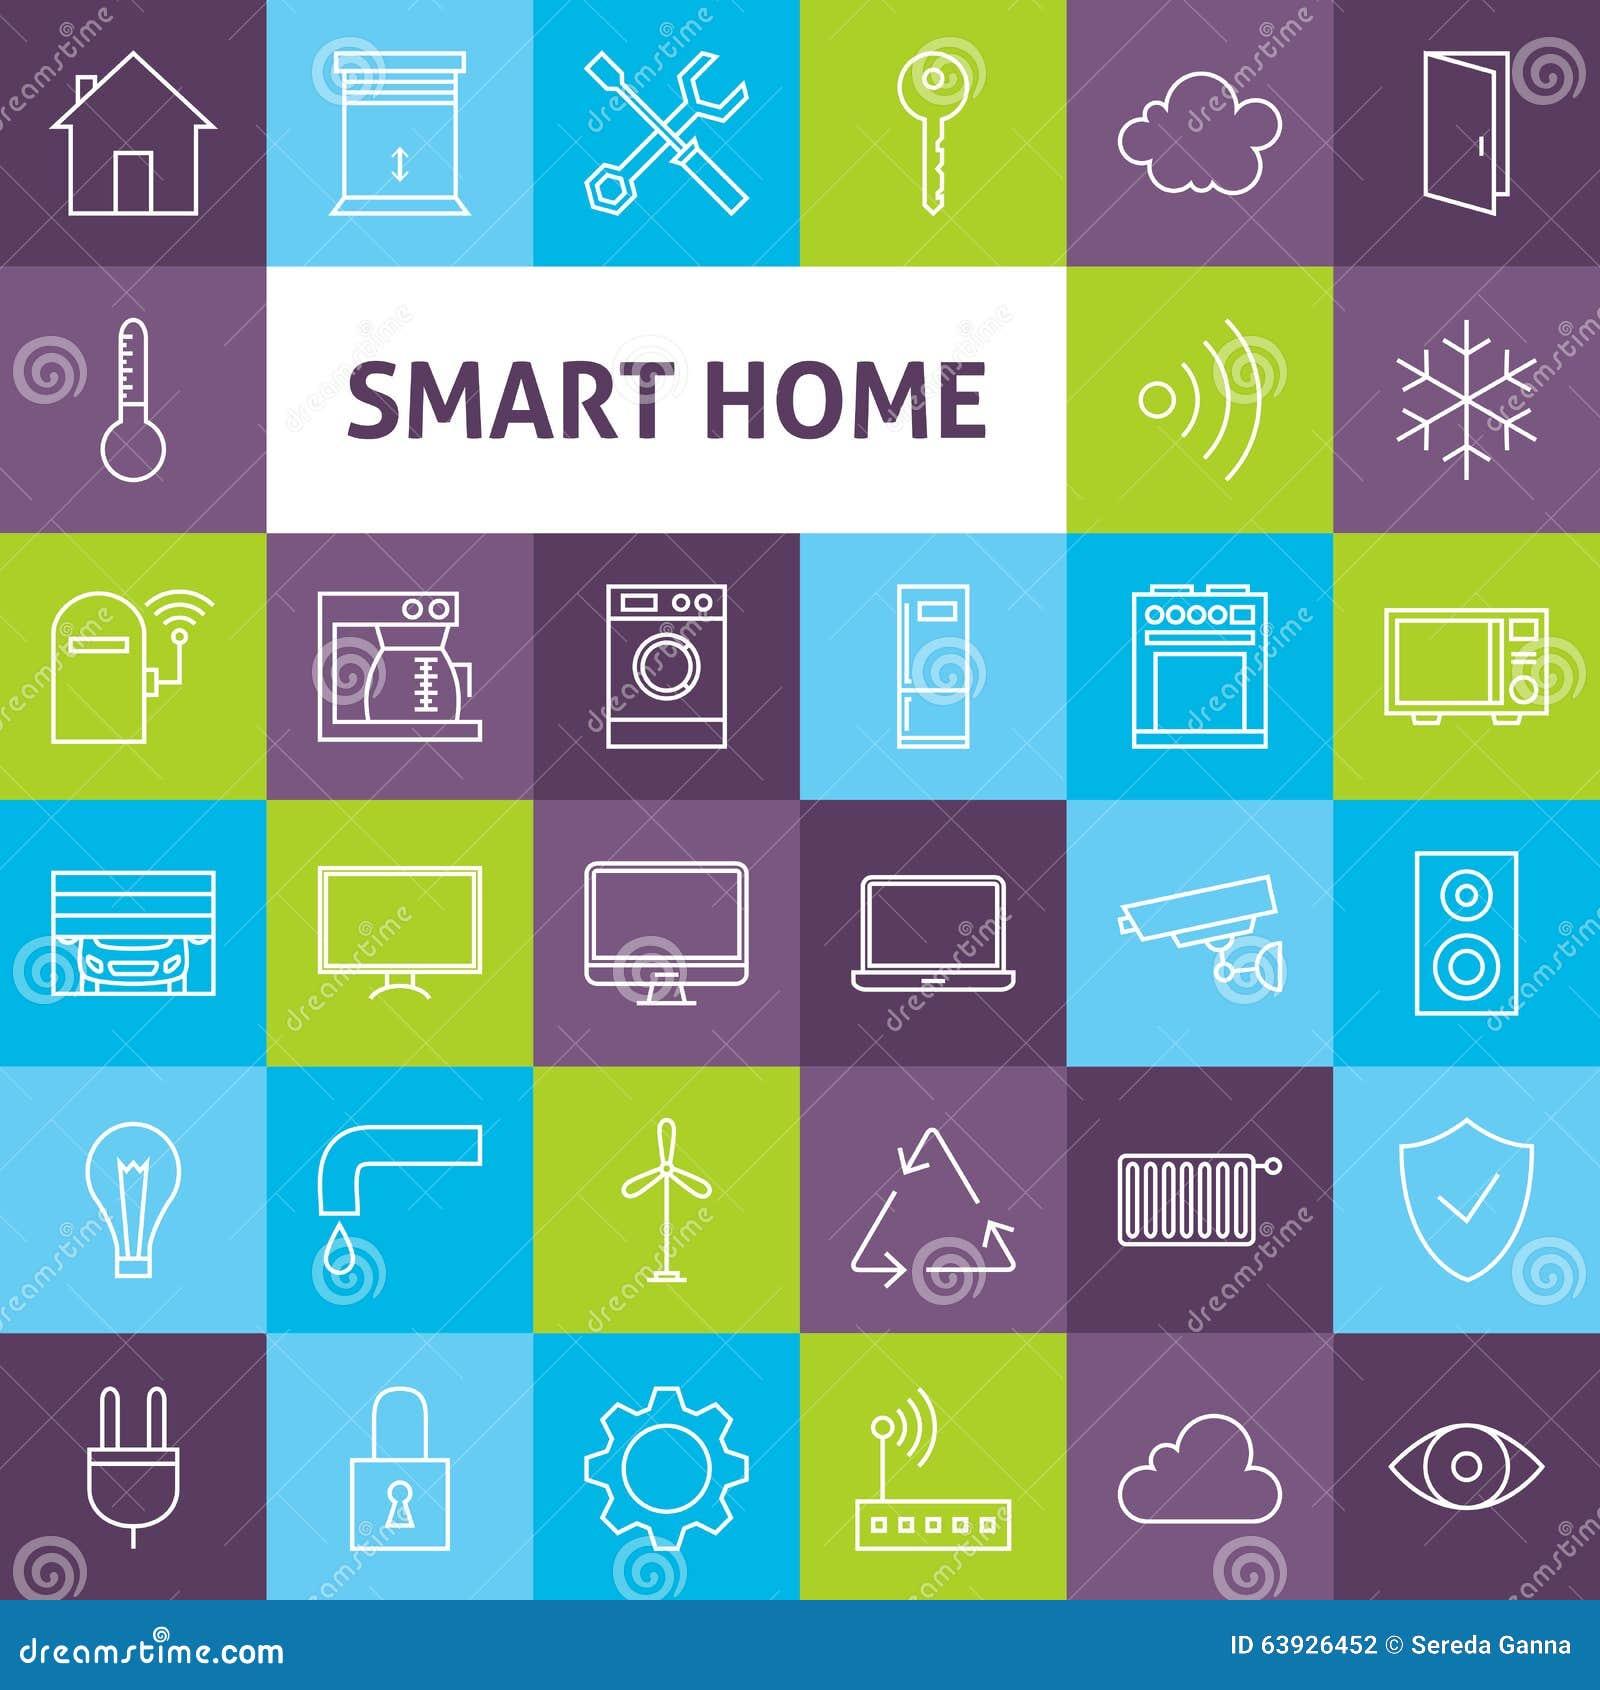 vector line art smart home icons set stock vector image 63926452. Black Bedroom Furniture Sets. Home Design Ideas